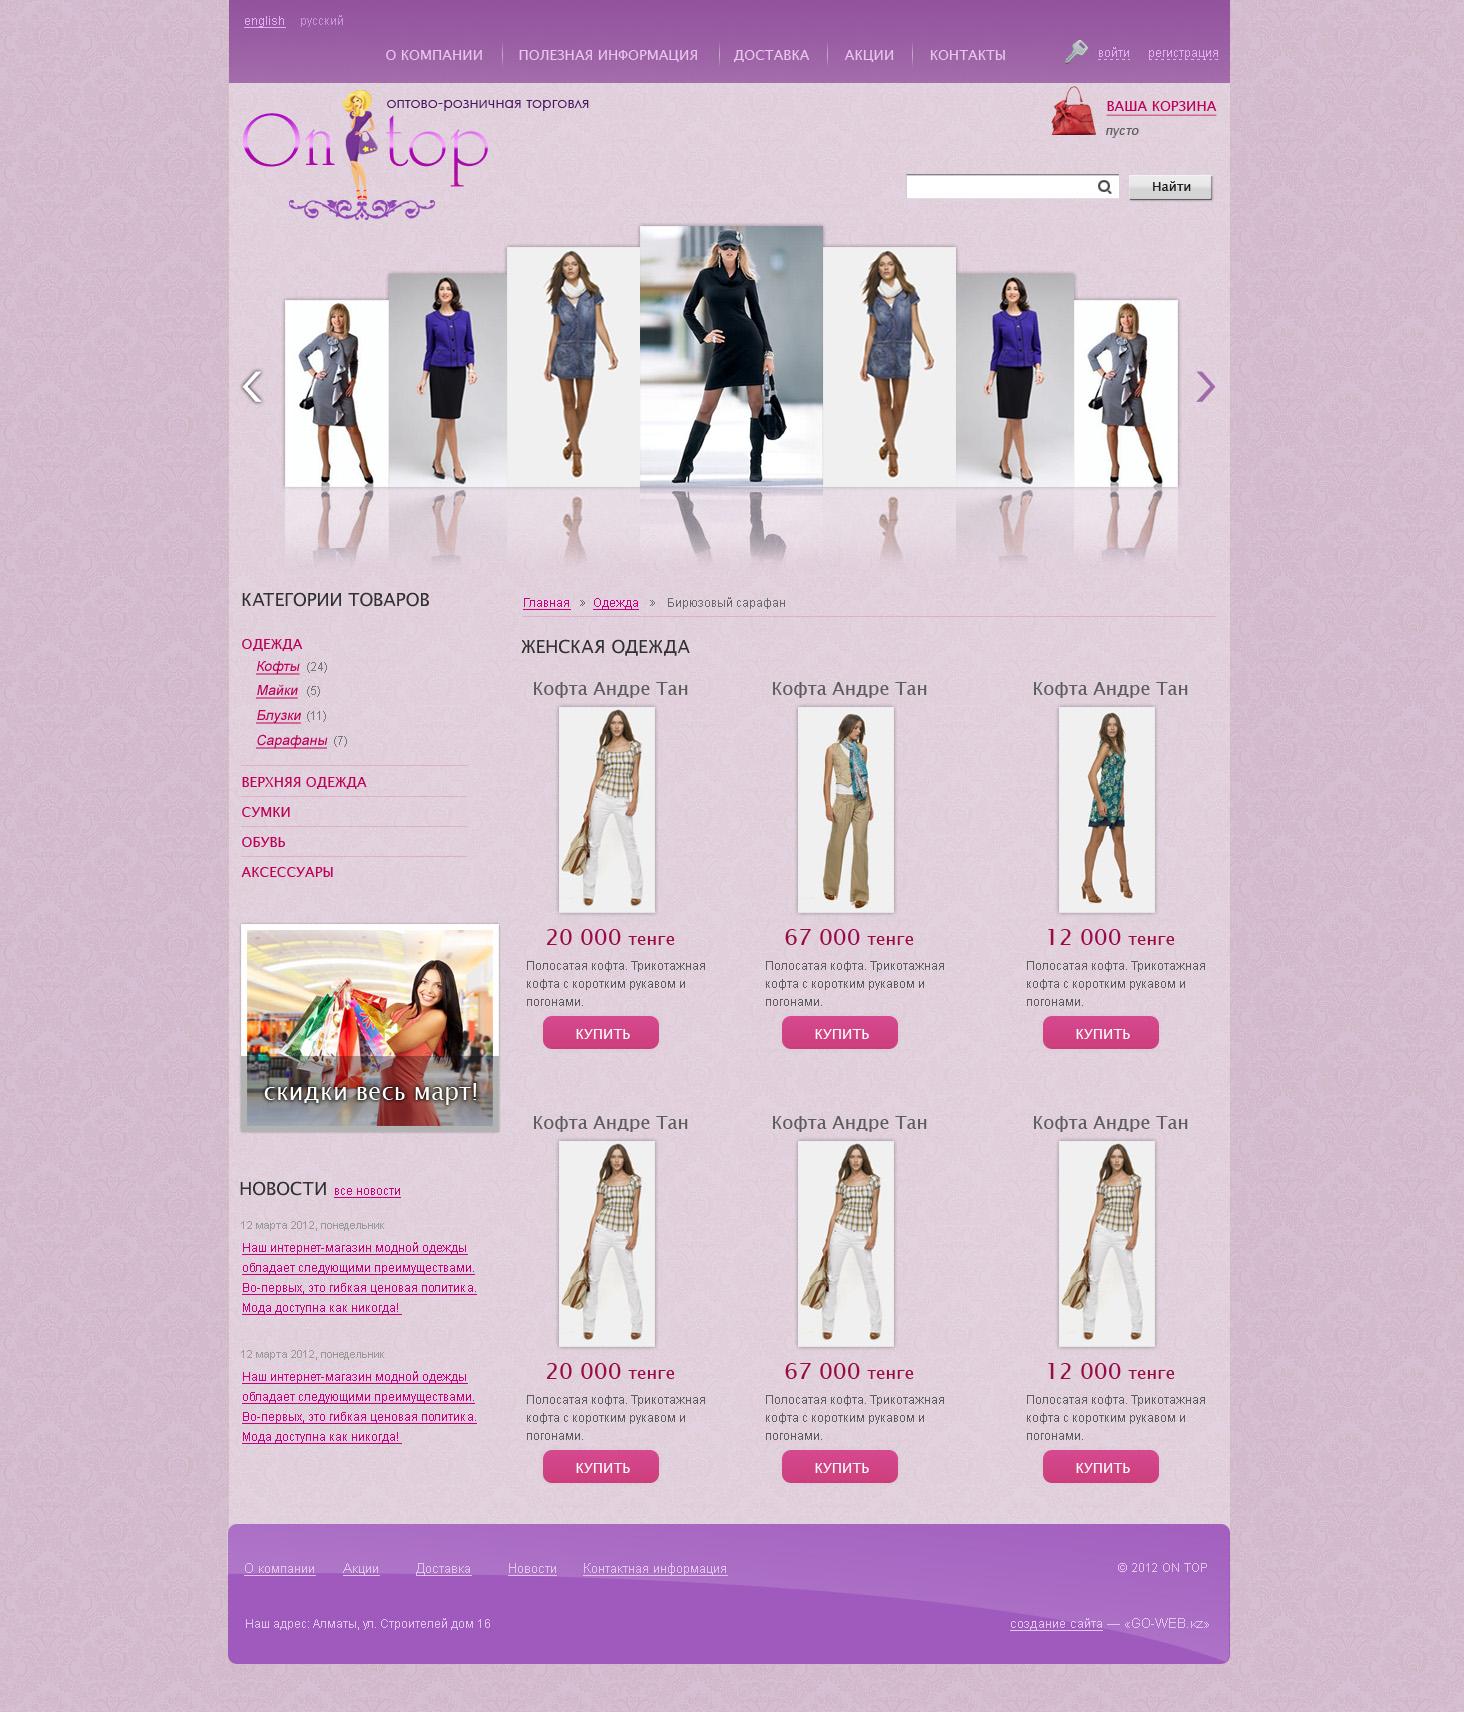 4a96a179a1a Интернет магазин женской одежды